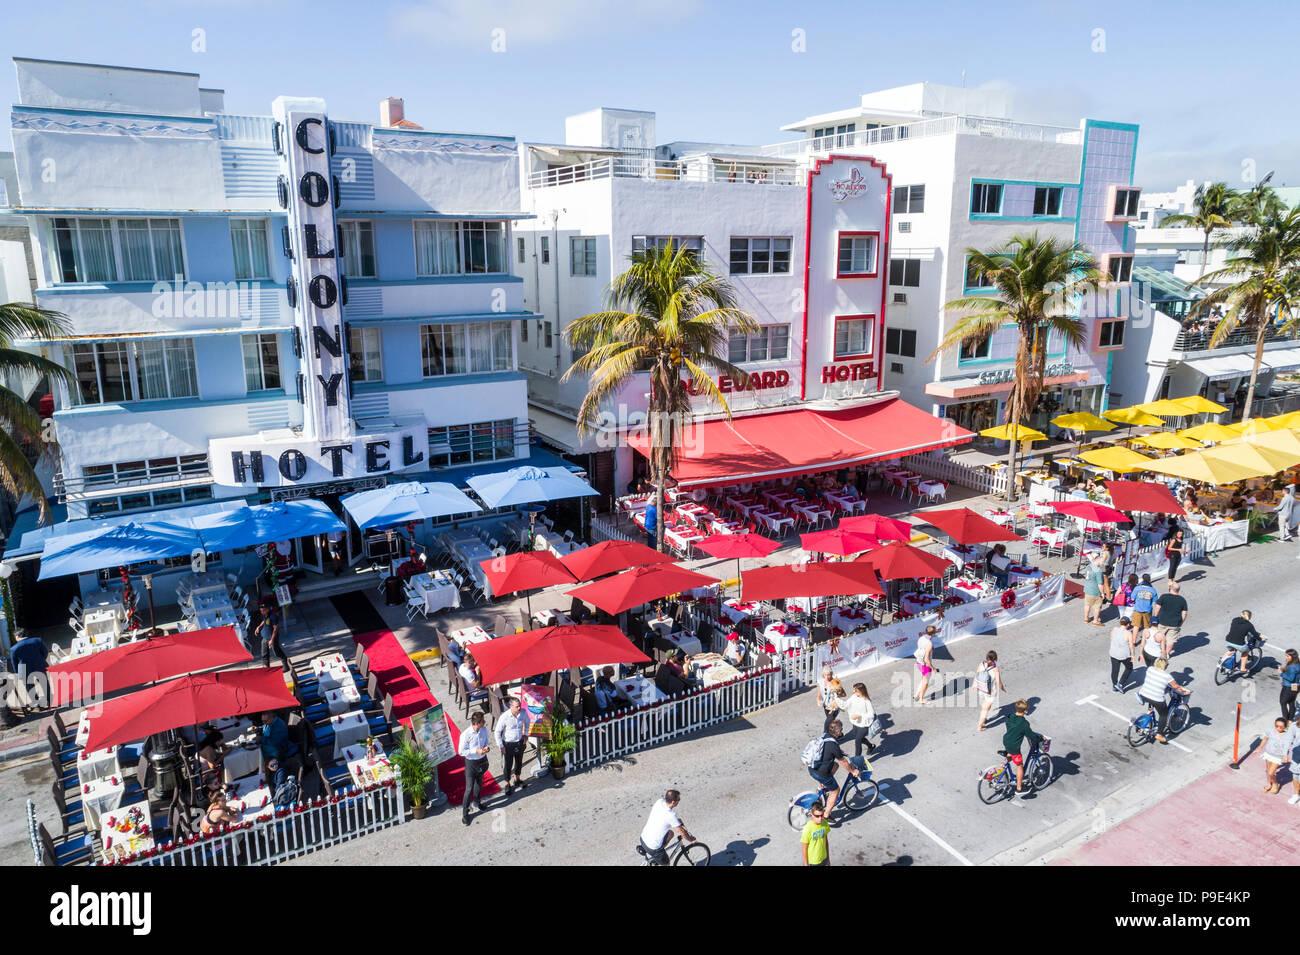 Miami Beach Florida Ocean Drive Art-Deco-Viertel Kolonie Boulevard Starlite hotel hotels Restaurant alfresco Sonnenschirme Radfahrer Antenne Overhead Stockbild